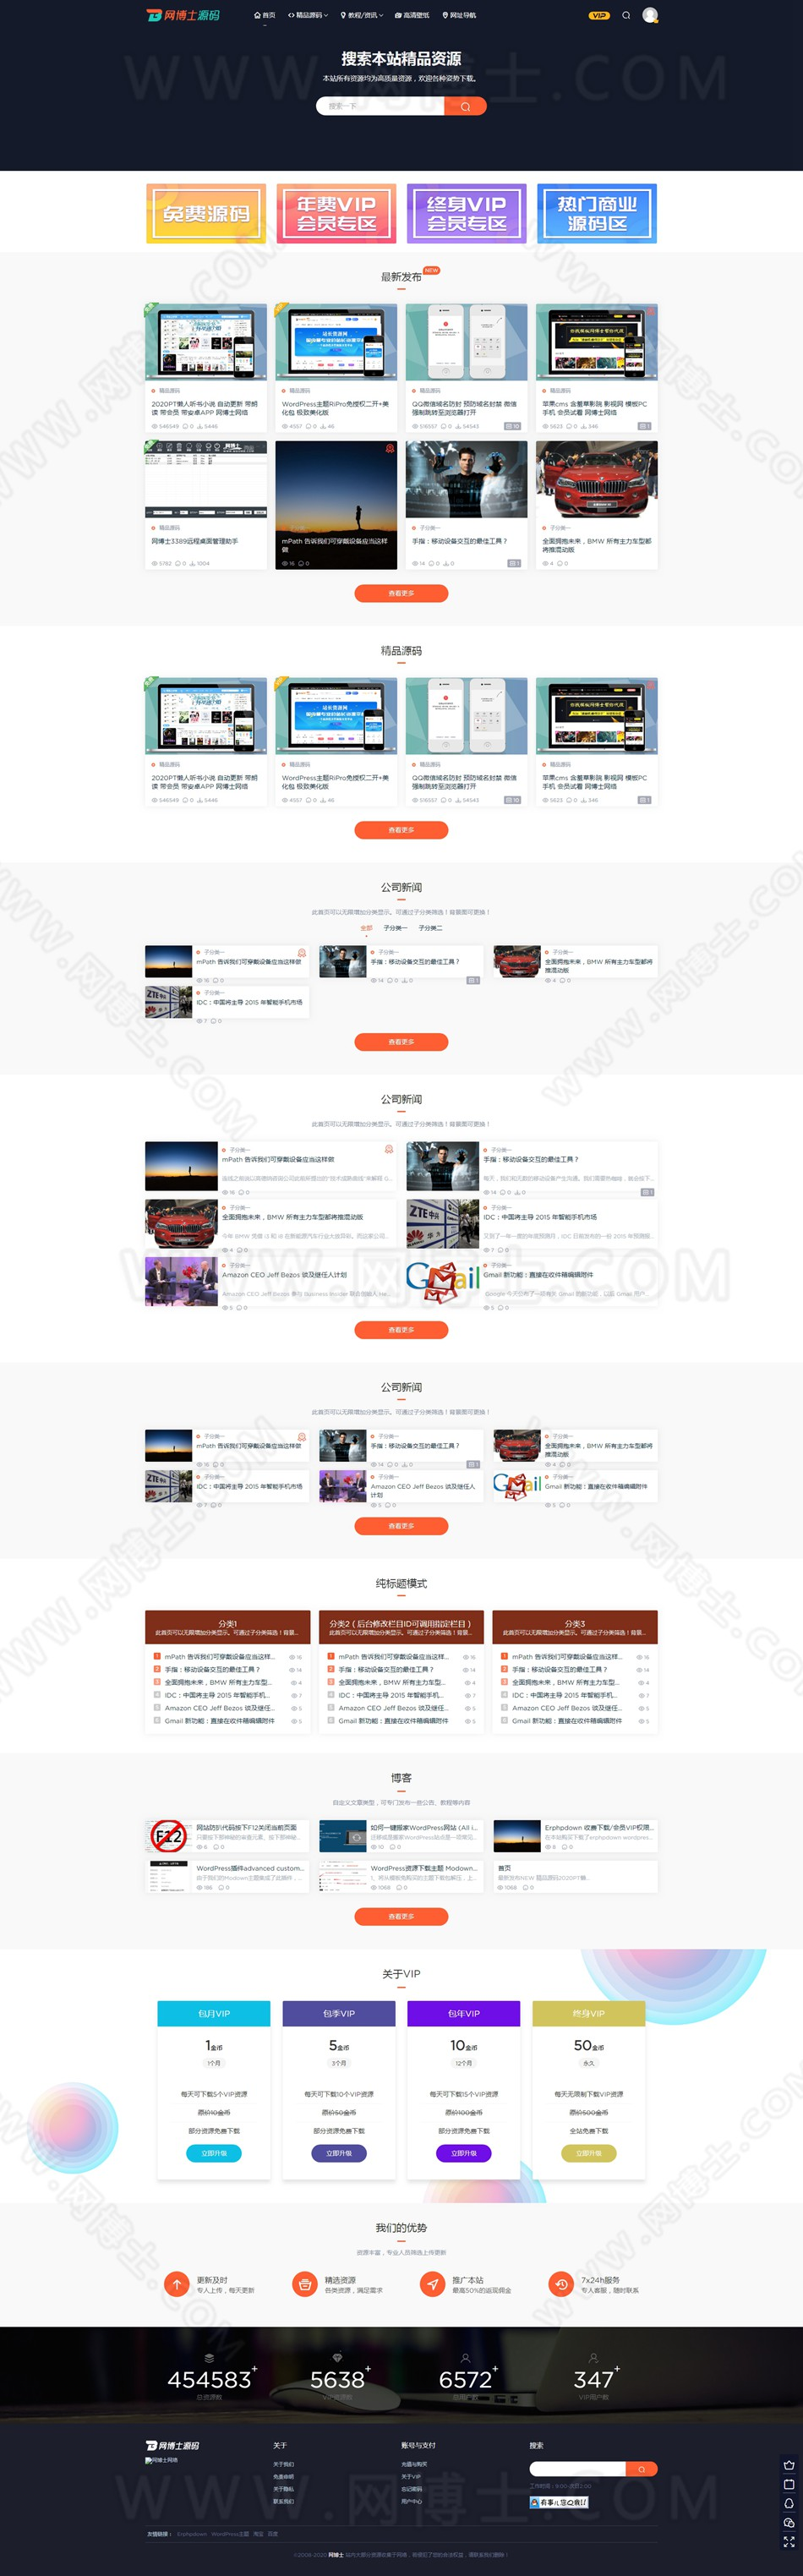 WordPress主题-模板兔新版 无限制版 适用于虚拟资源分享下载平台